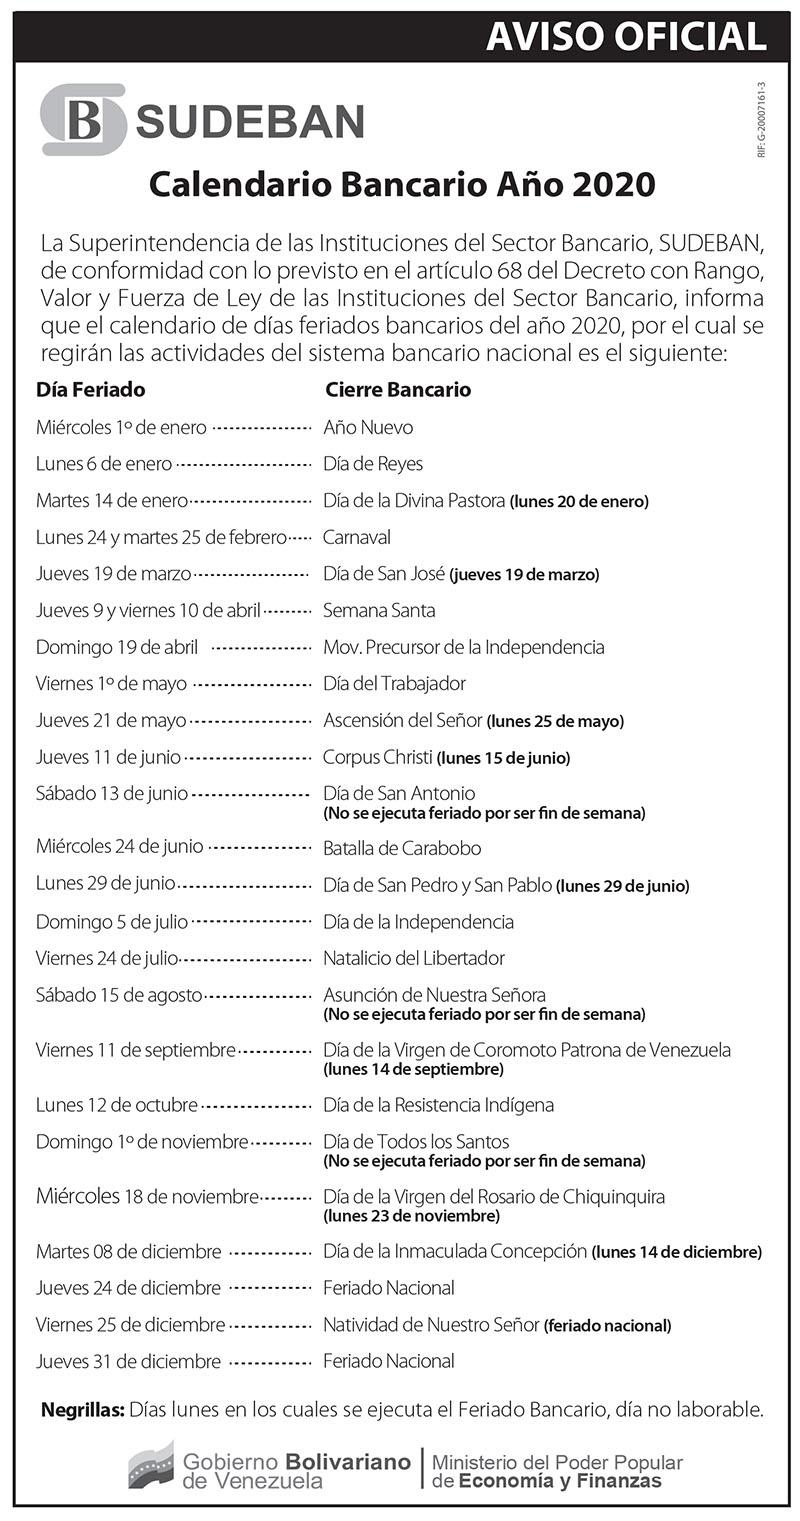 Lunes Bancarios 2020 Venezuela